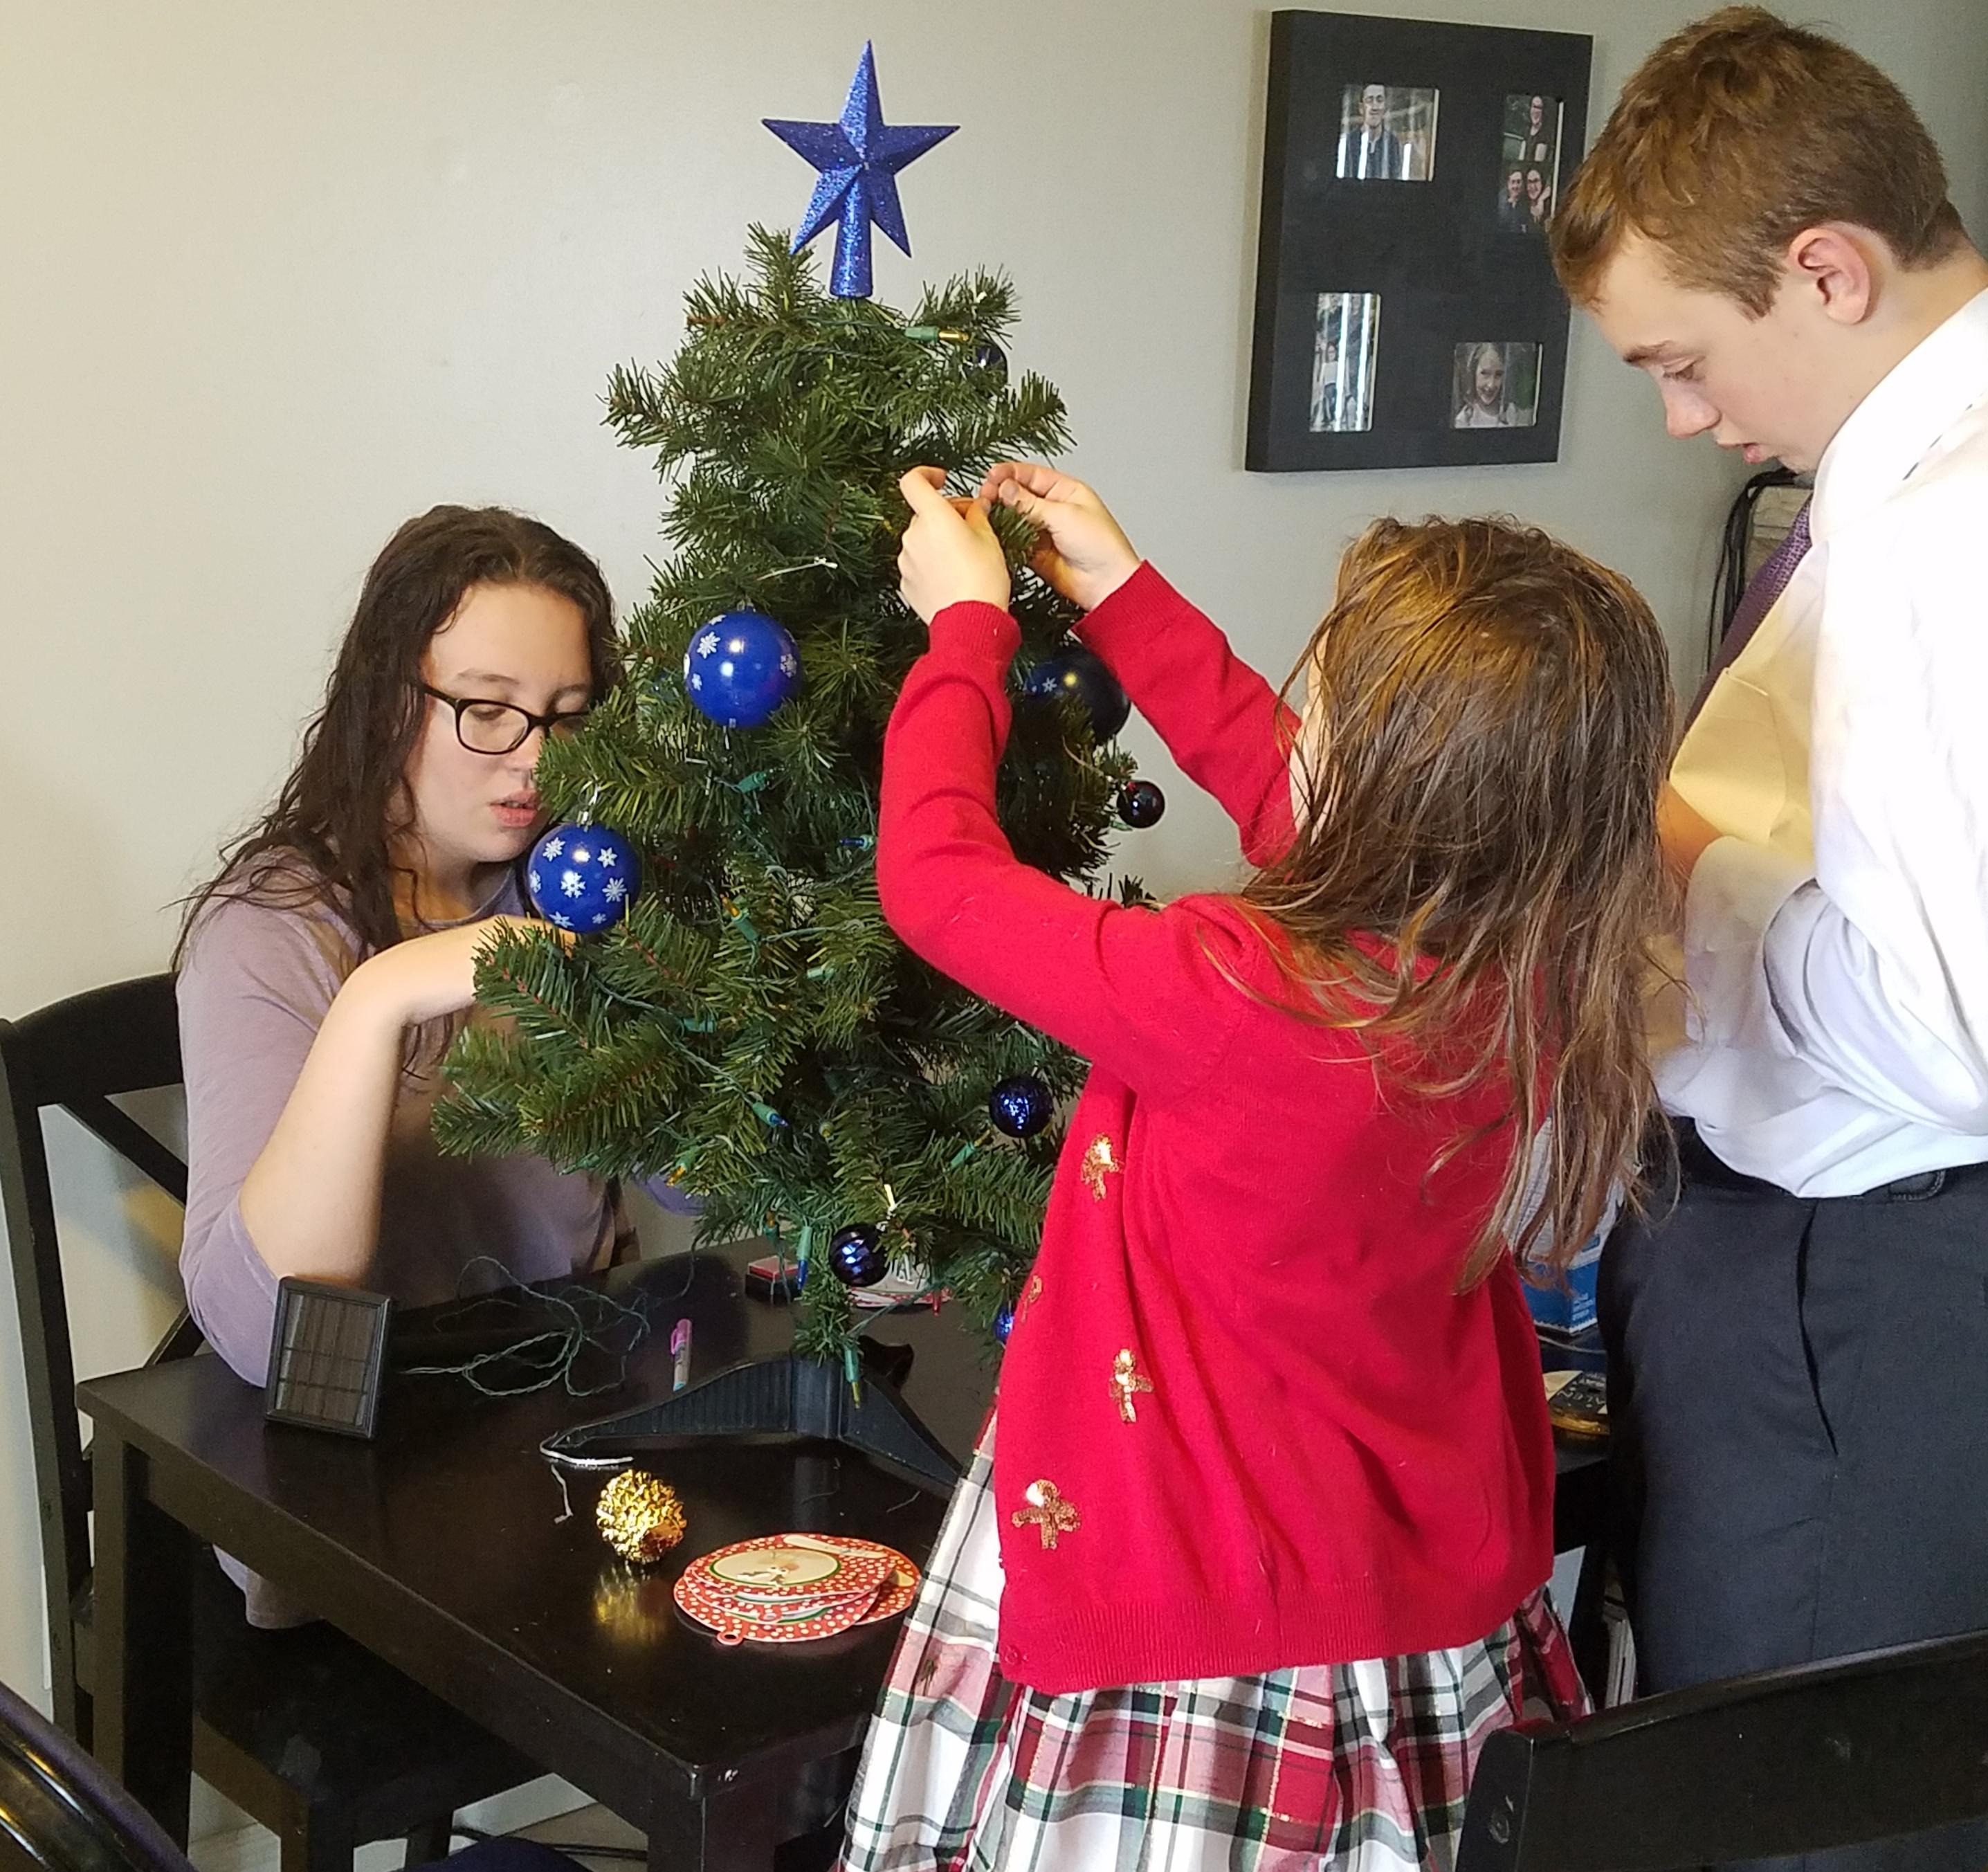 decorating dads tree